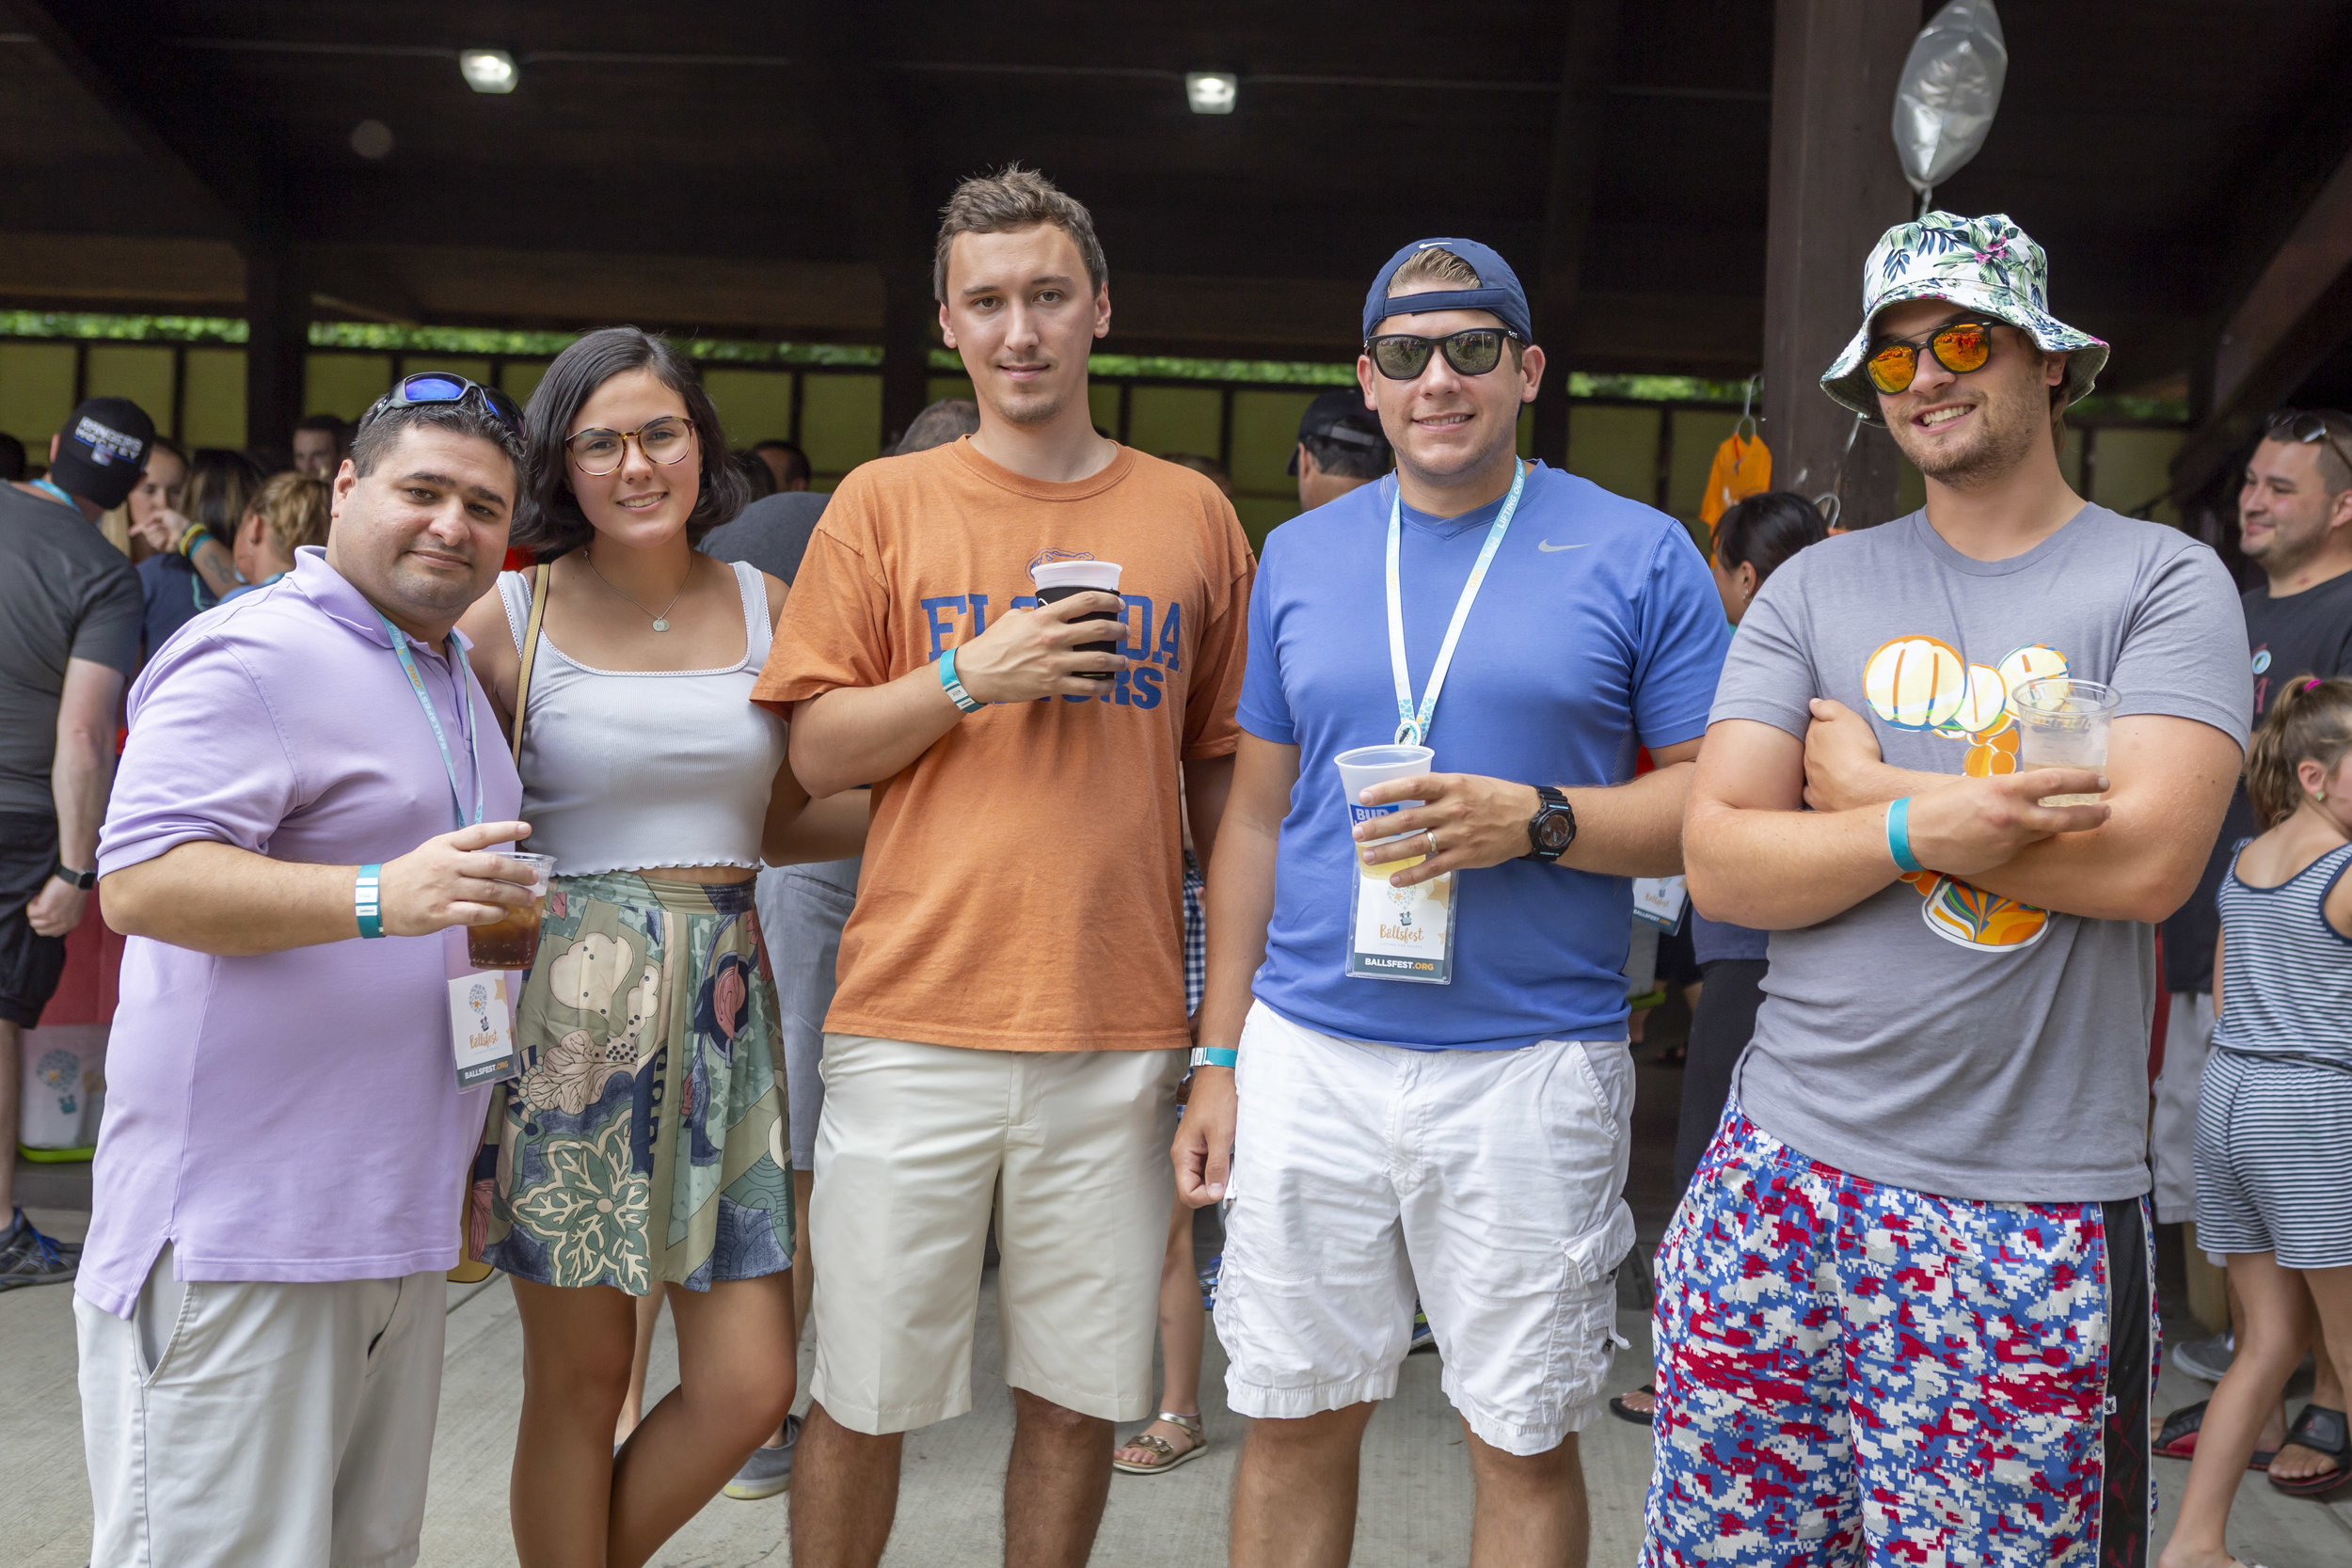 (2018.07.14) Ballsfest Saratoga Spa State Park-3747.jpg